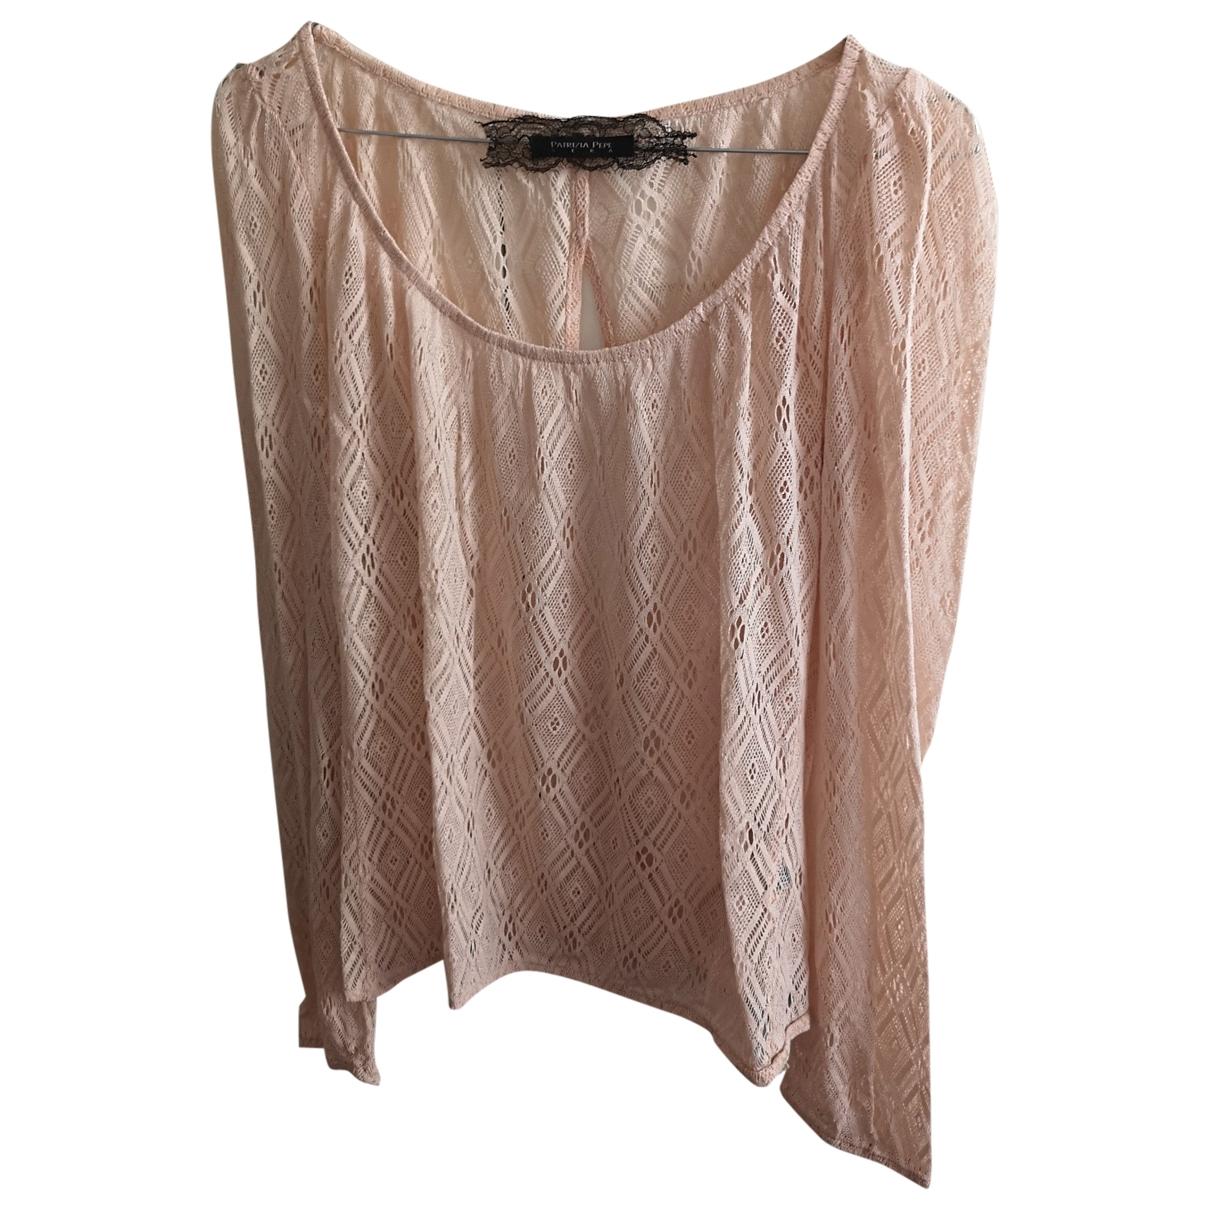 Patrizia Pepe \N Pink Lace  top for Women 40 IT